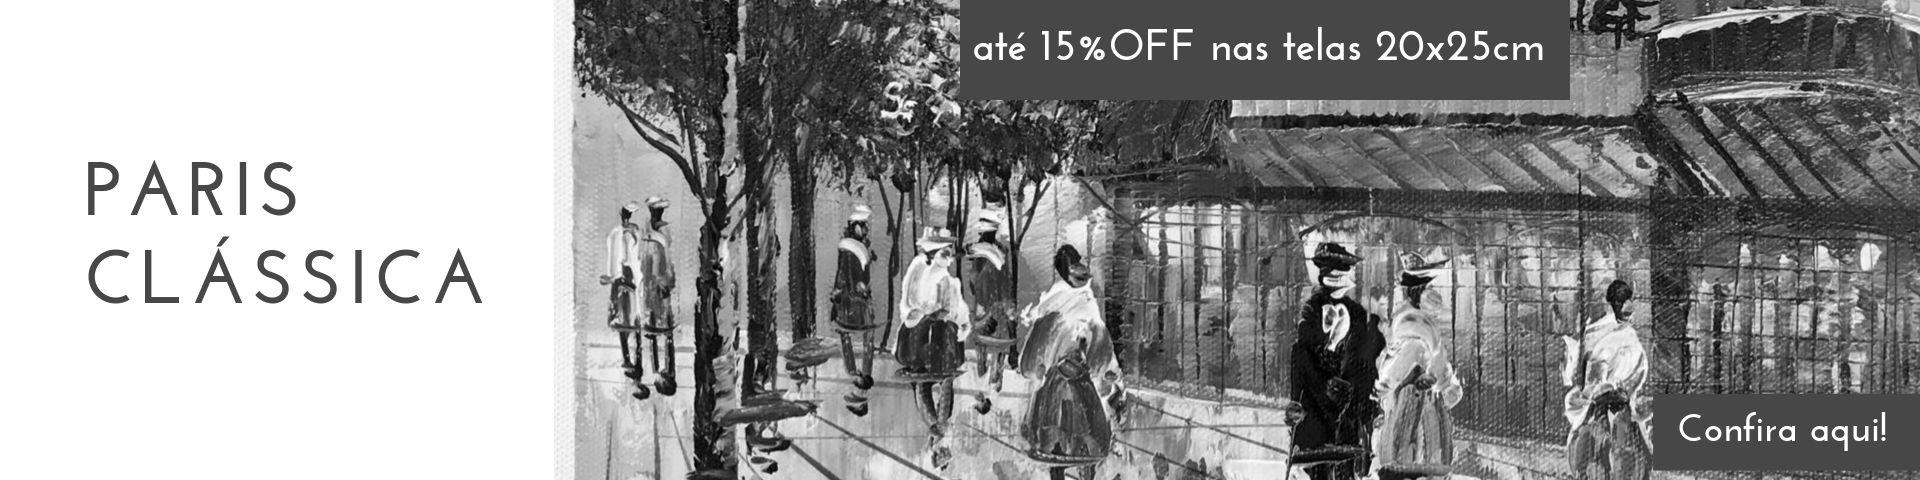 15% OFF PARIS CLÁSSICA 1